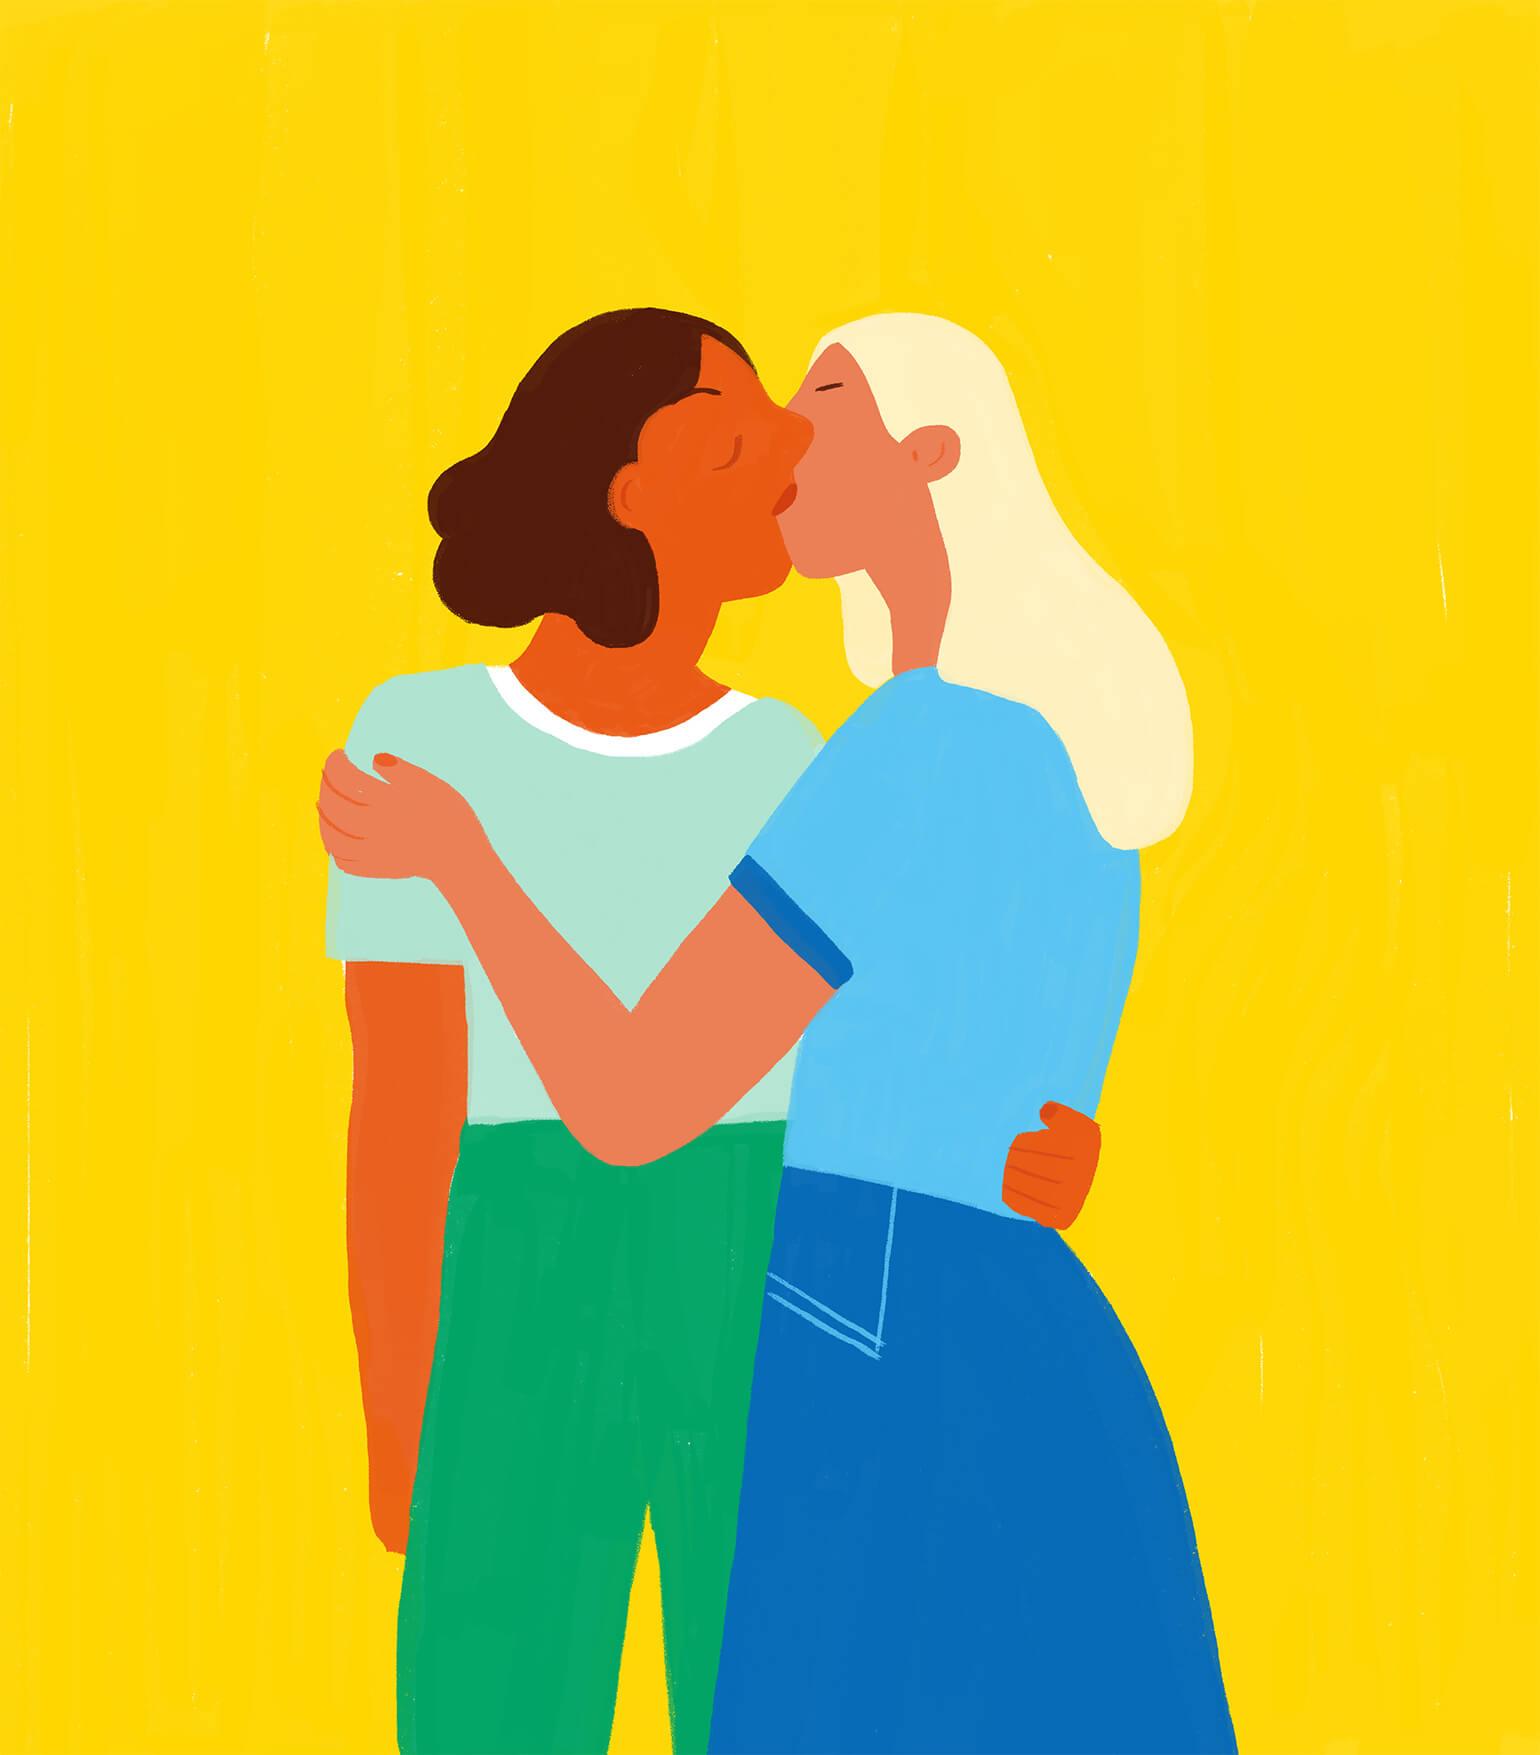 pride-month-queer-women-kissing-illustration-violeta-noy